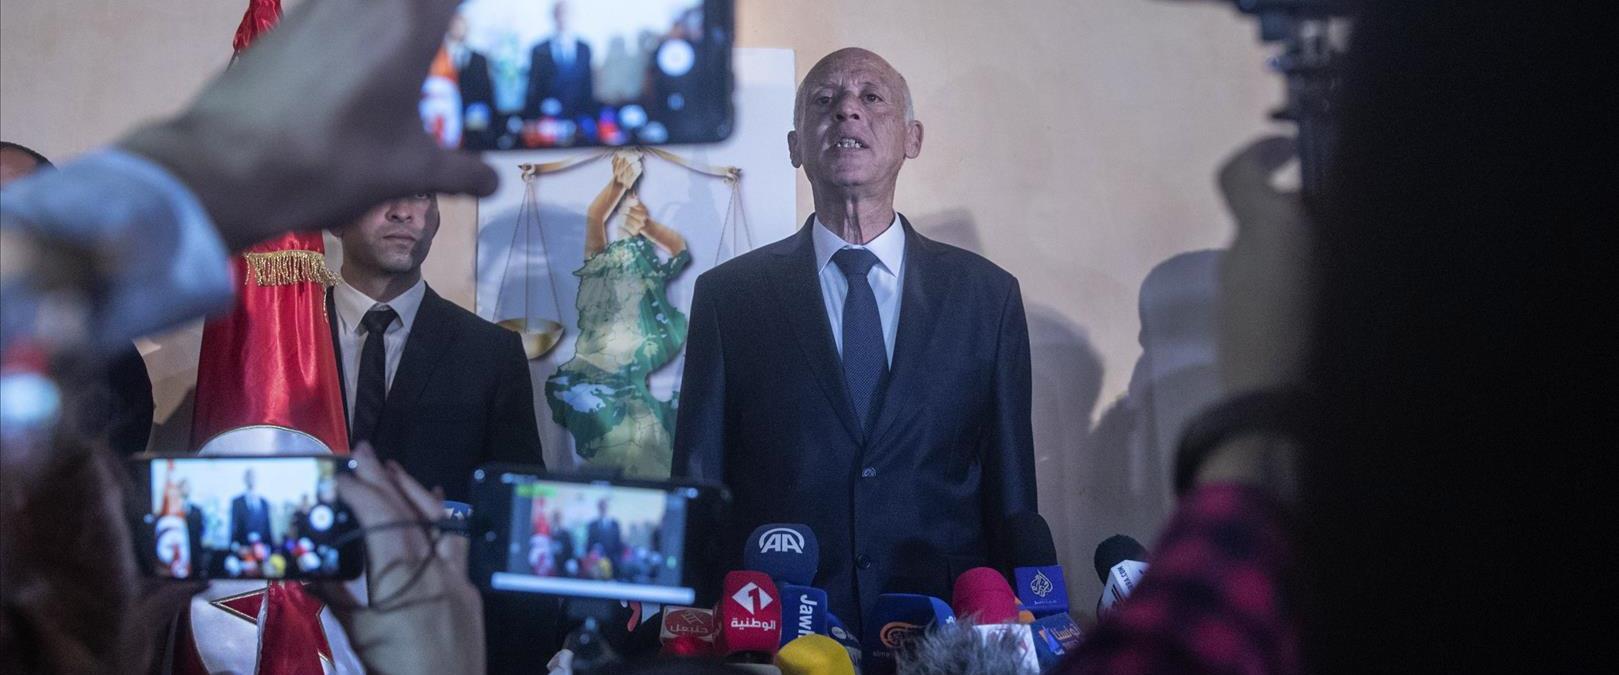 נשיא תוניסיה הנבחר, קאיס סעיד